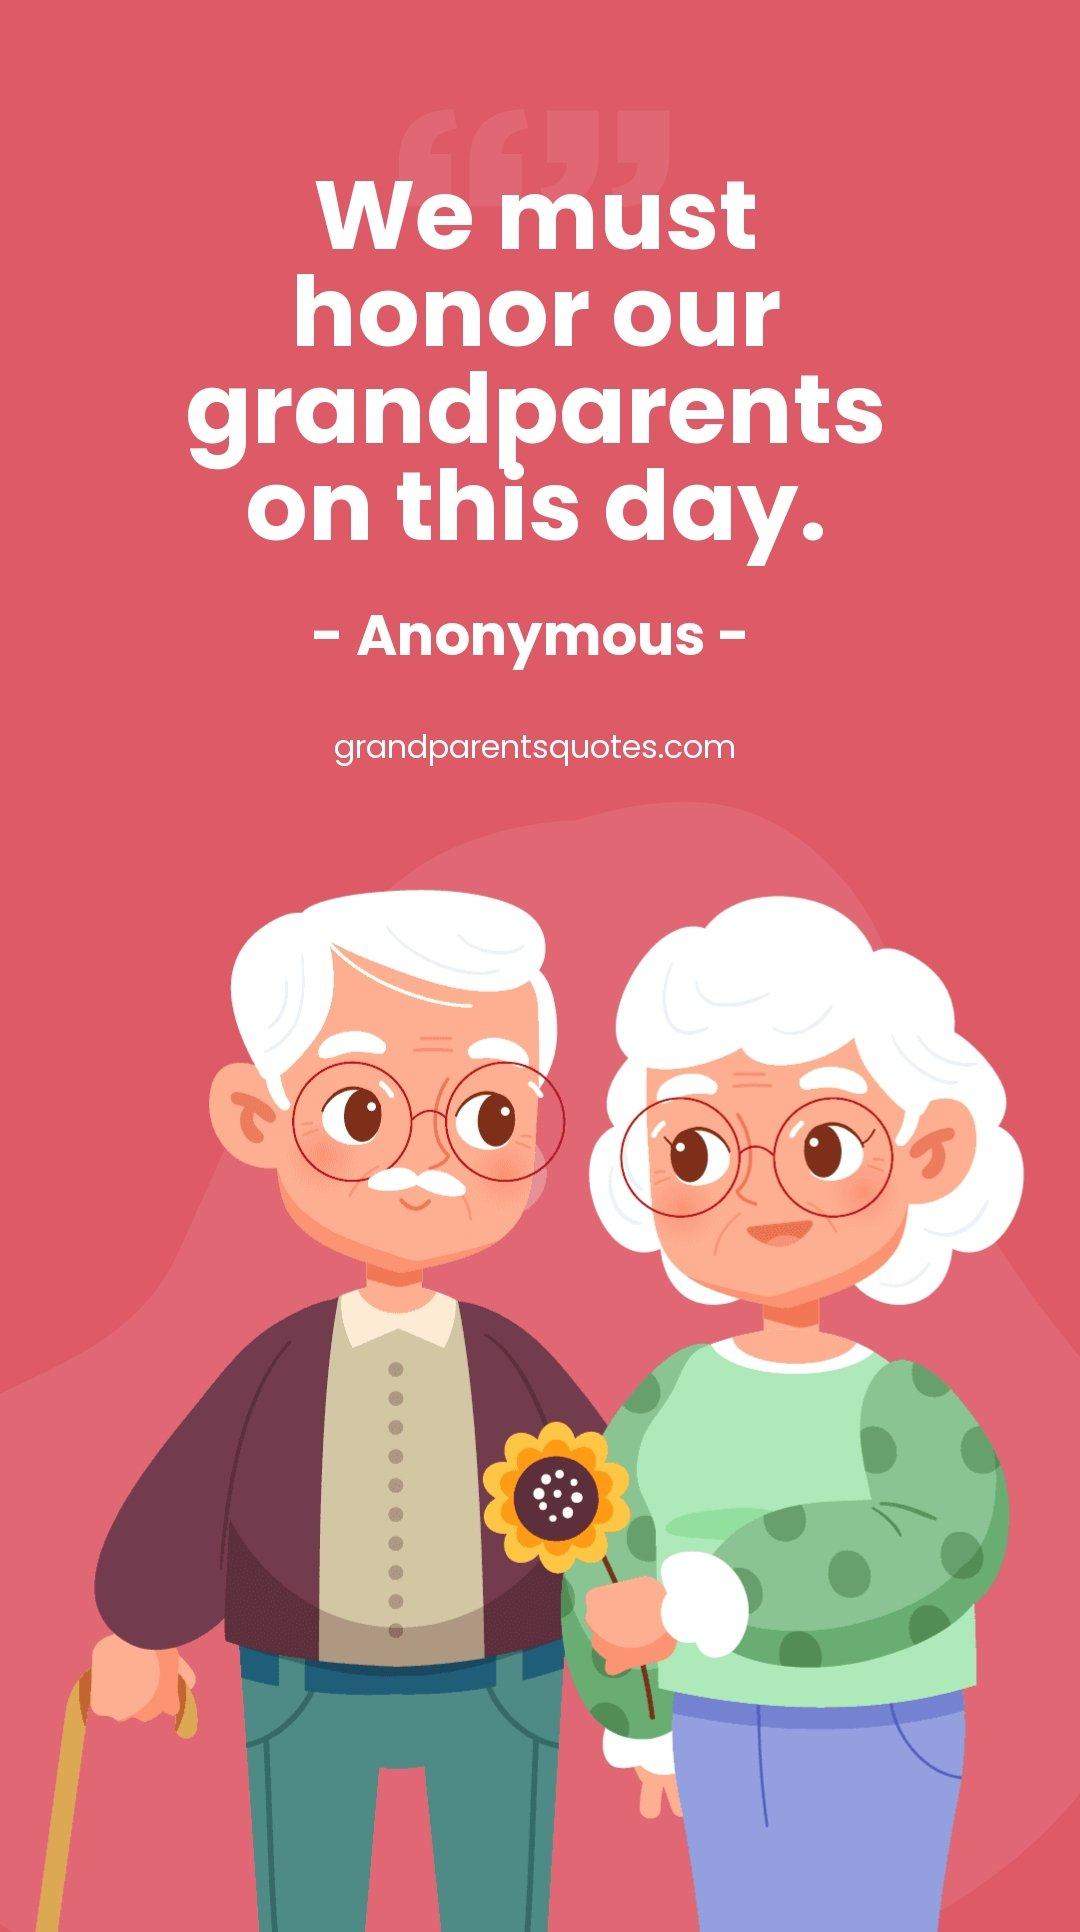 Grandparents Day Quote Whatsapp Post Template.jpe